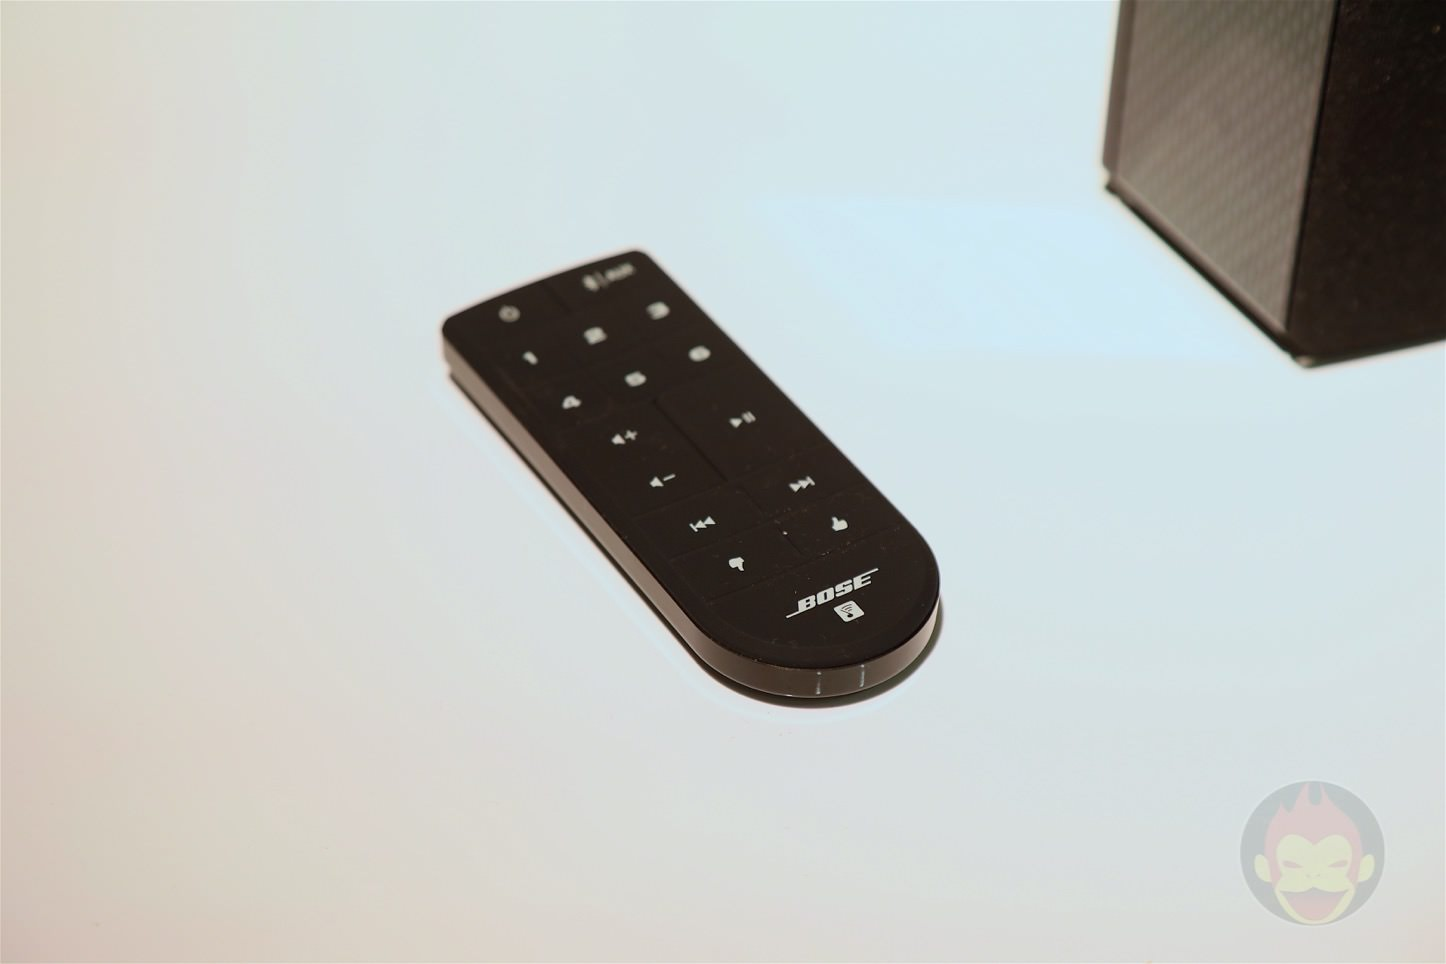 Bose-SoundTouch-Wireless-Speakers-06.jpg